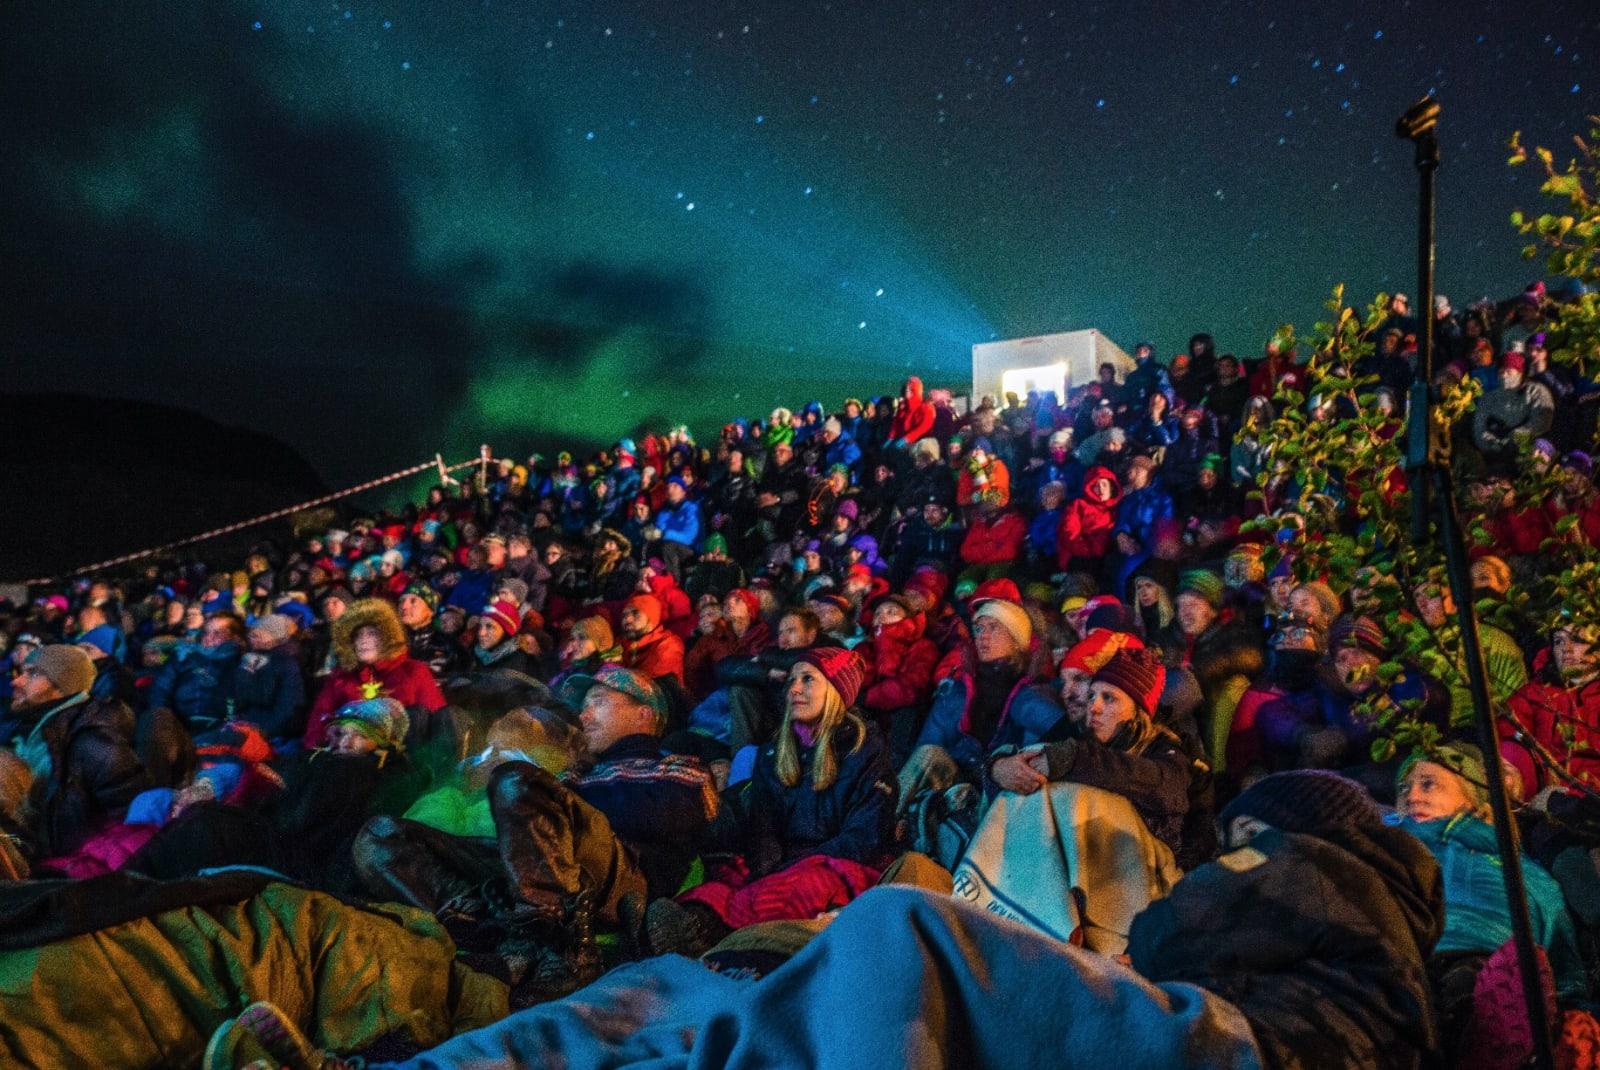 Foto: Fjellfilmfestivalen